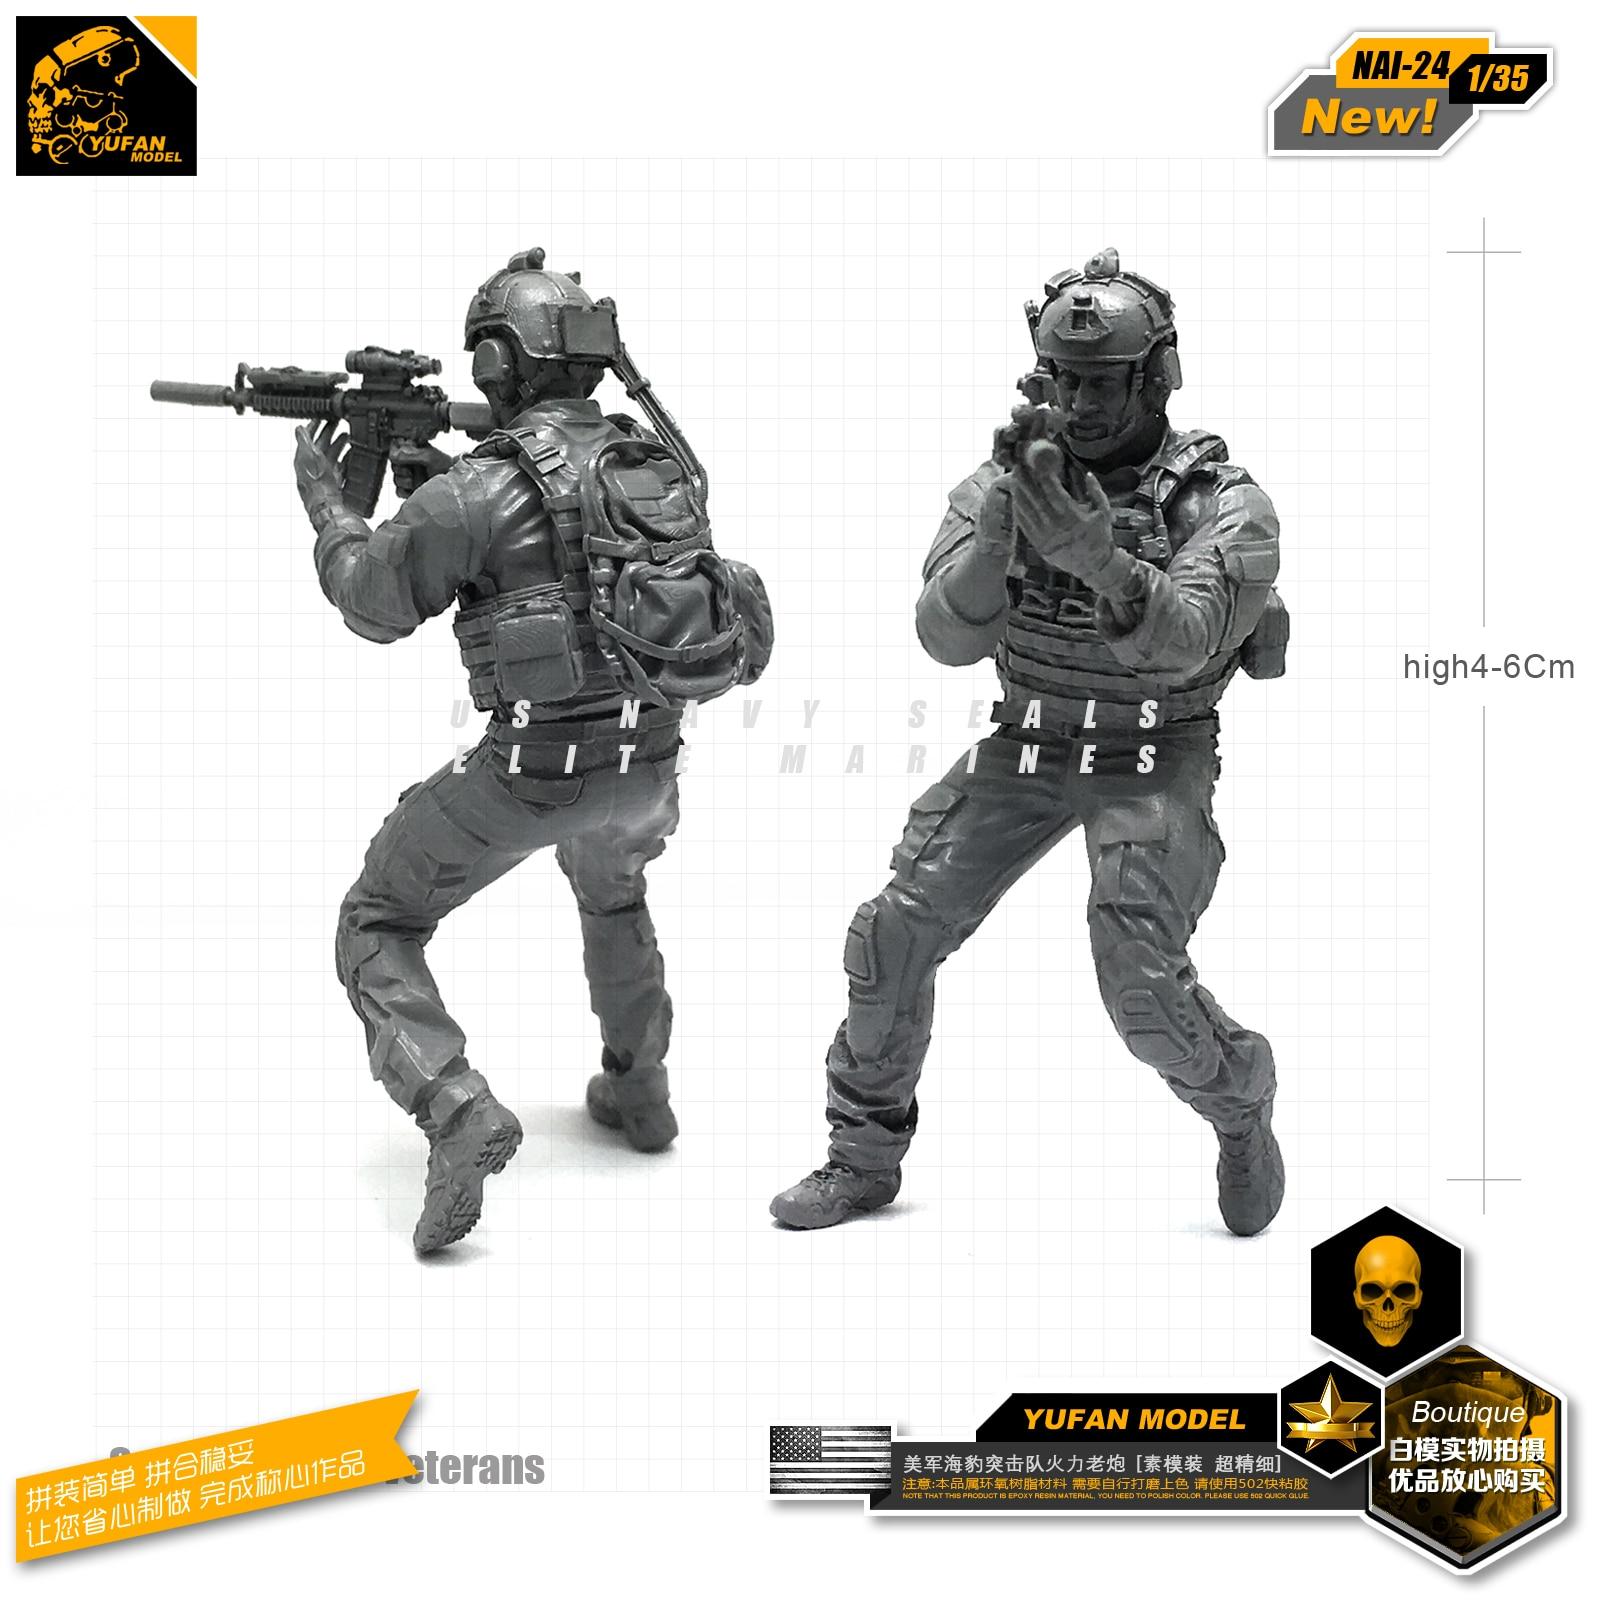 Yufan Model 1/35 Figure Model Kit Modern American Seal Veterans Resin Soldier Model Nai-24